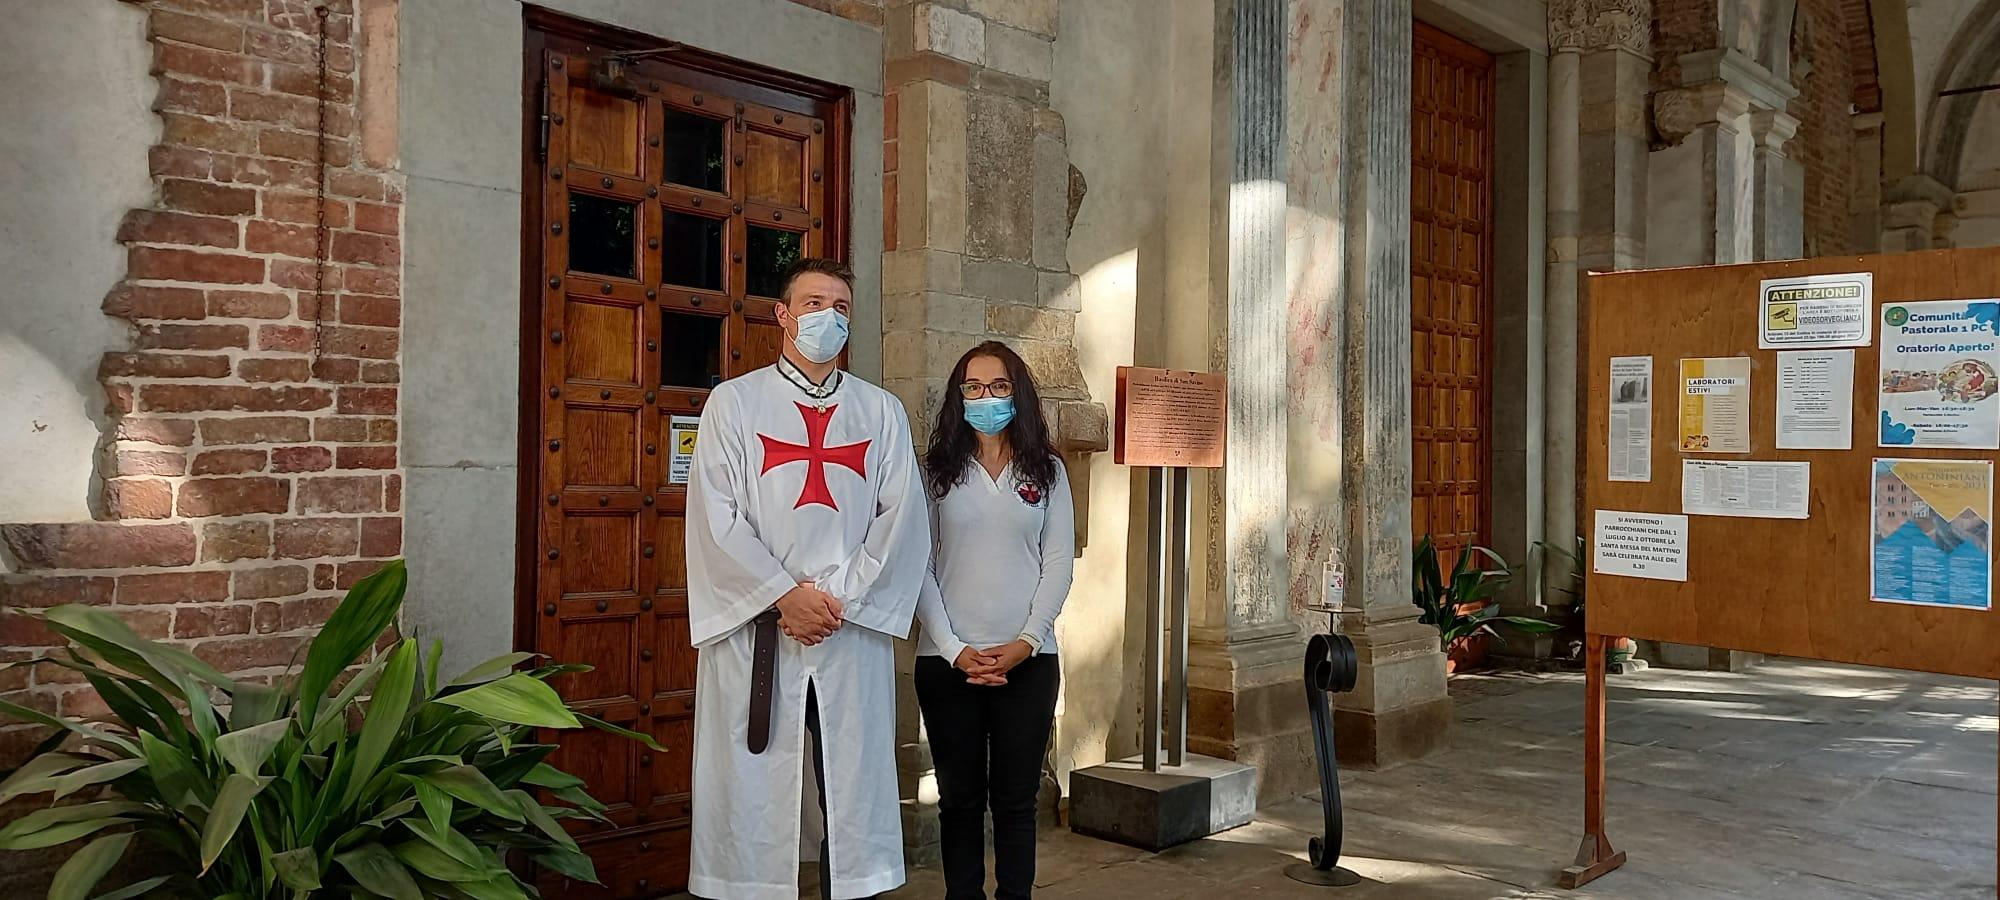 Turno di custodia Chiesa di San Savino – Piacenza 24.07.2021